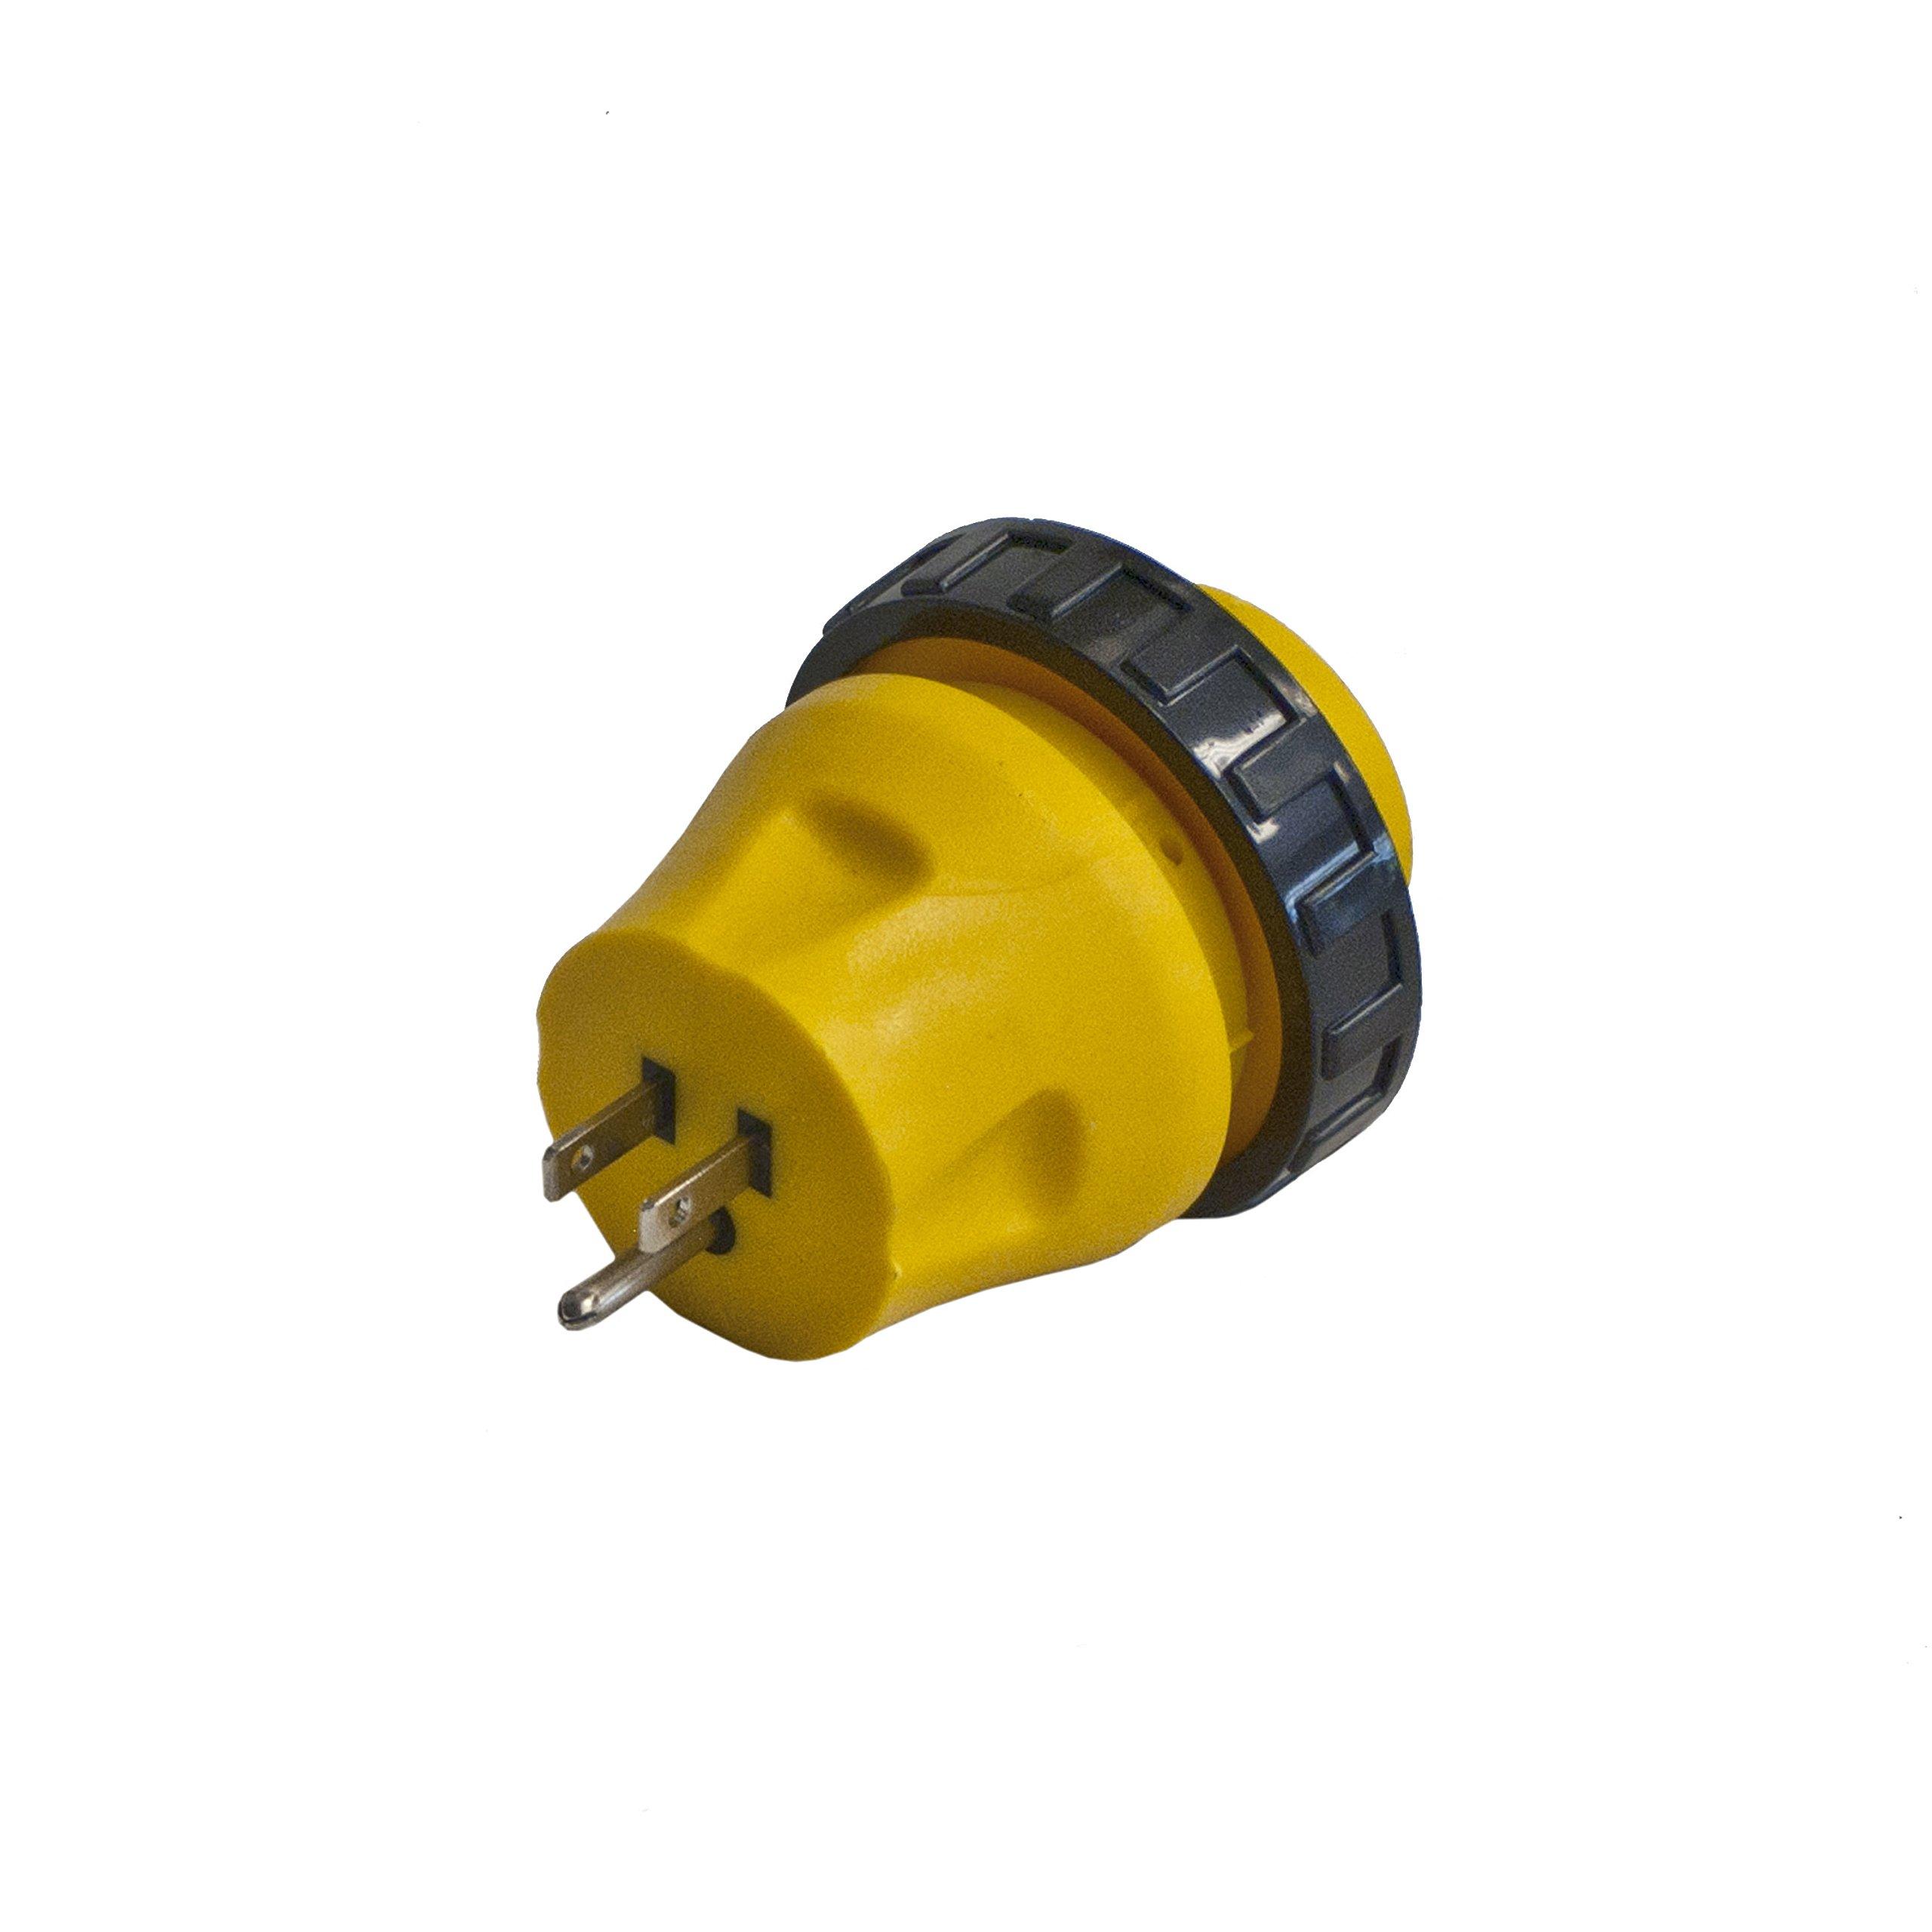 ALEKO L15-30 RV Electrical Locking Adapter 15A Male To 30A Female Locking Plug Connector